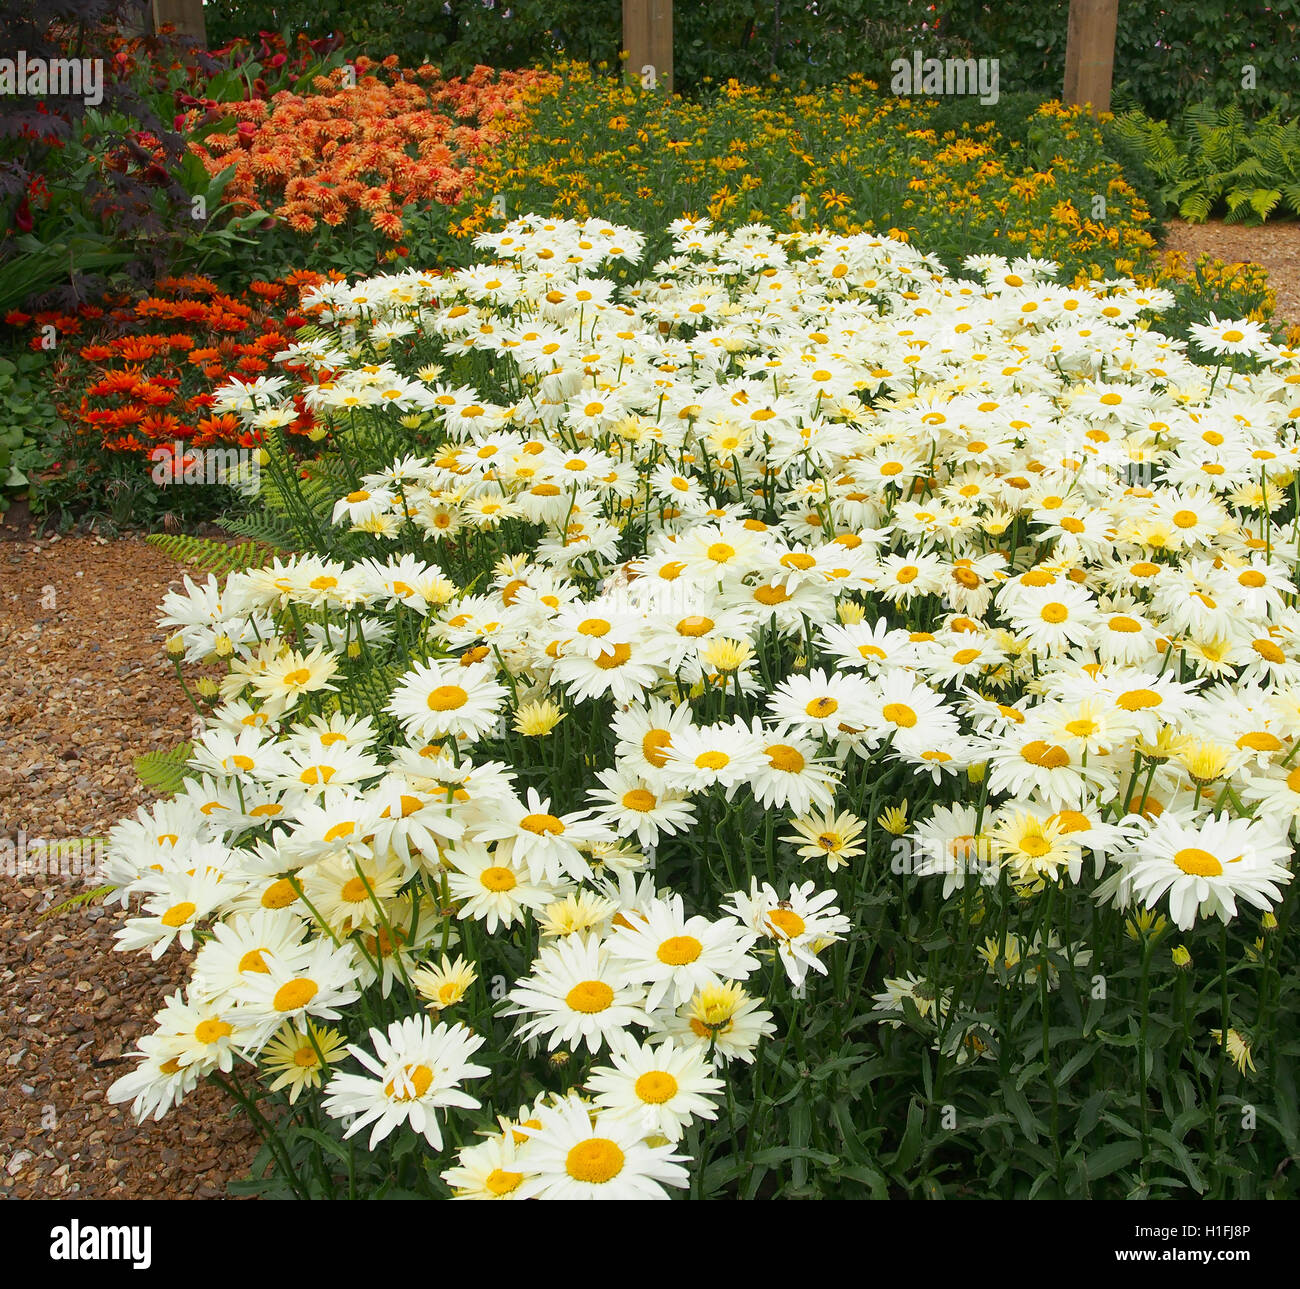 Large white chrysanthemum leucanthemum oxeye daisies flowers stock large white chrysanthemum leucanthemum oxeye daisies flowers growing in a perennial border at tatton park flower show cheshire uk in 2016 izmirmasajfo